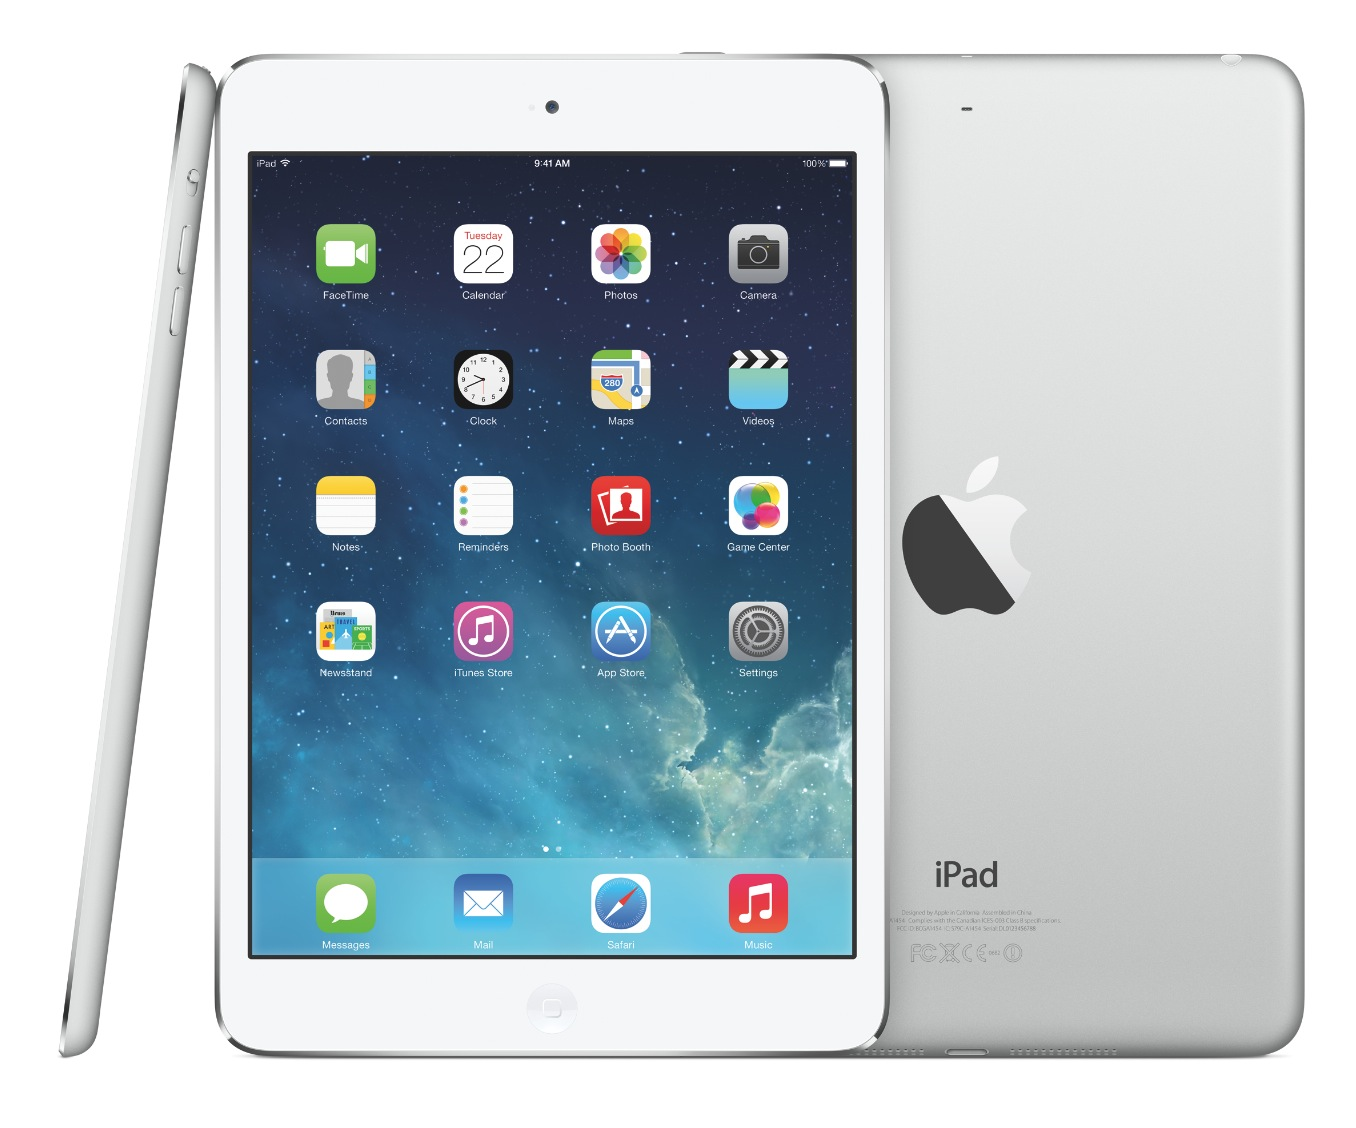 Apple iPad Air MD788BA 97 Internet Tablet 16GB WiFi iOS 7   White D 1356x1128